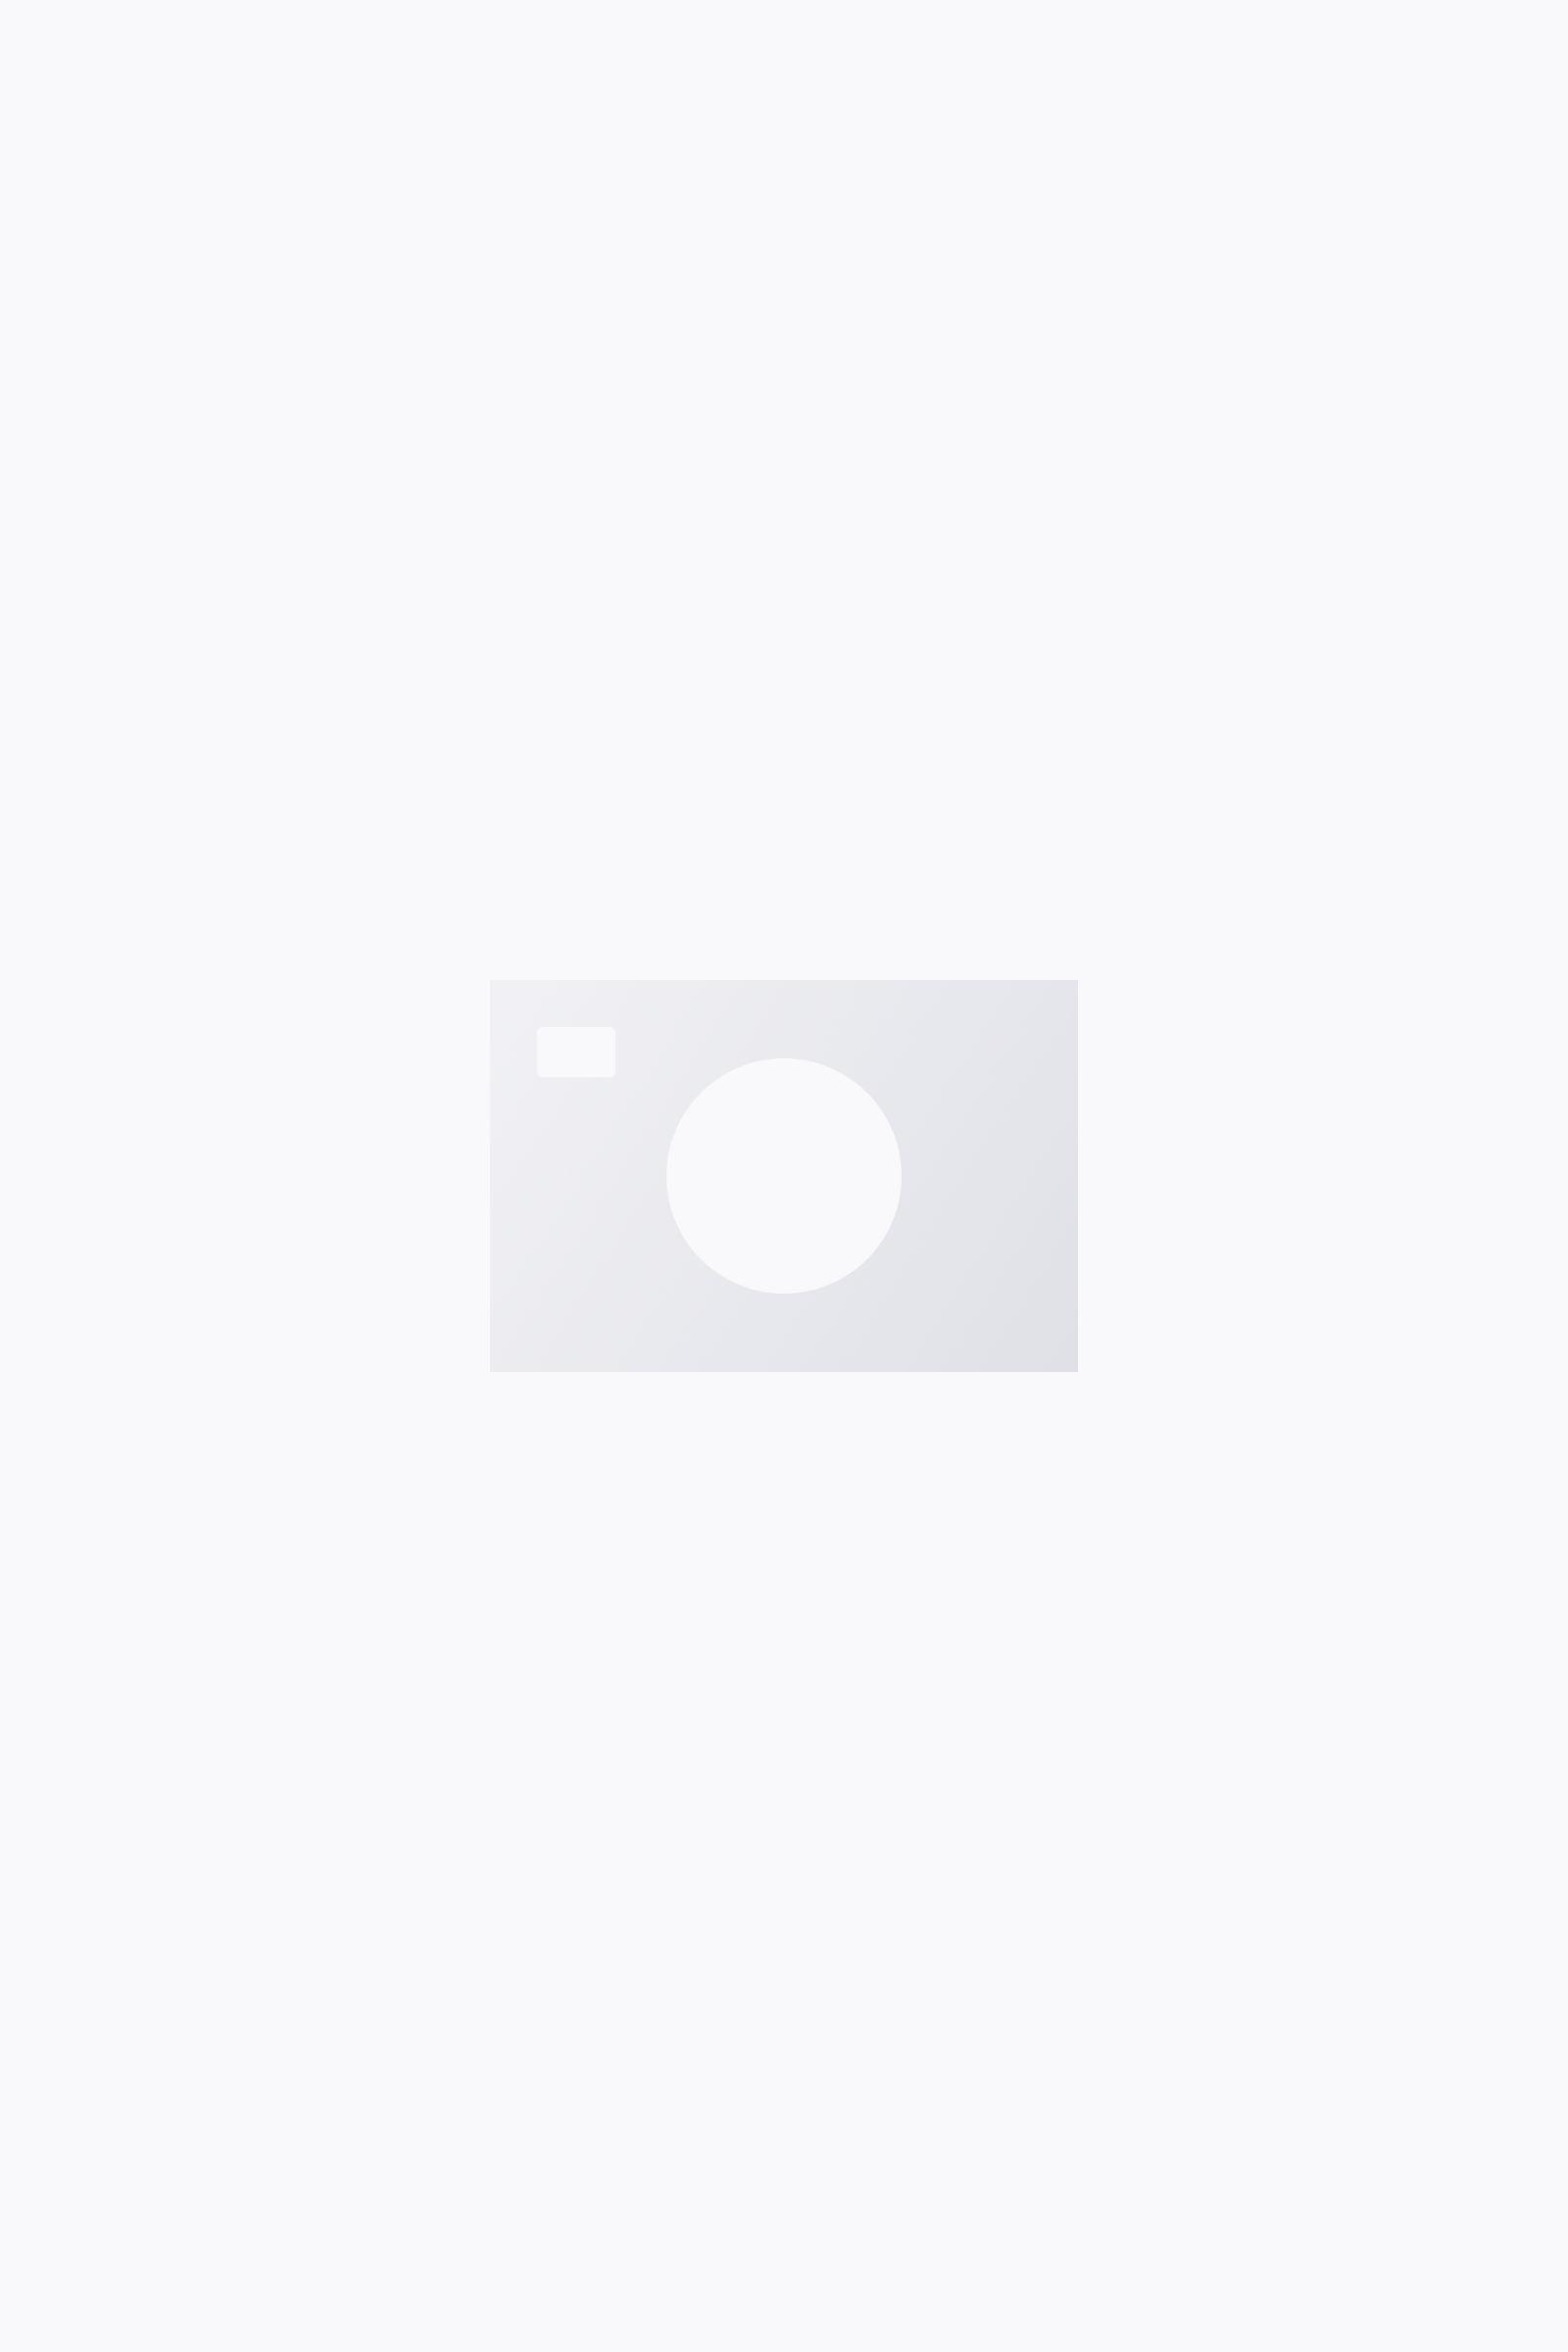 COS SLIM-FIT T-SHIRT,navy / grey